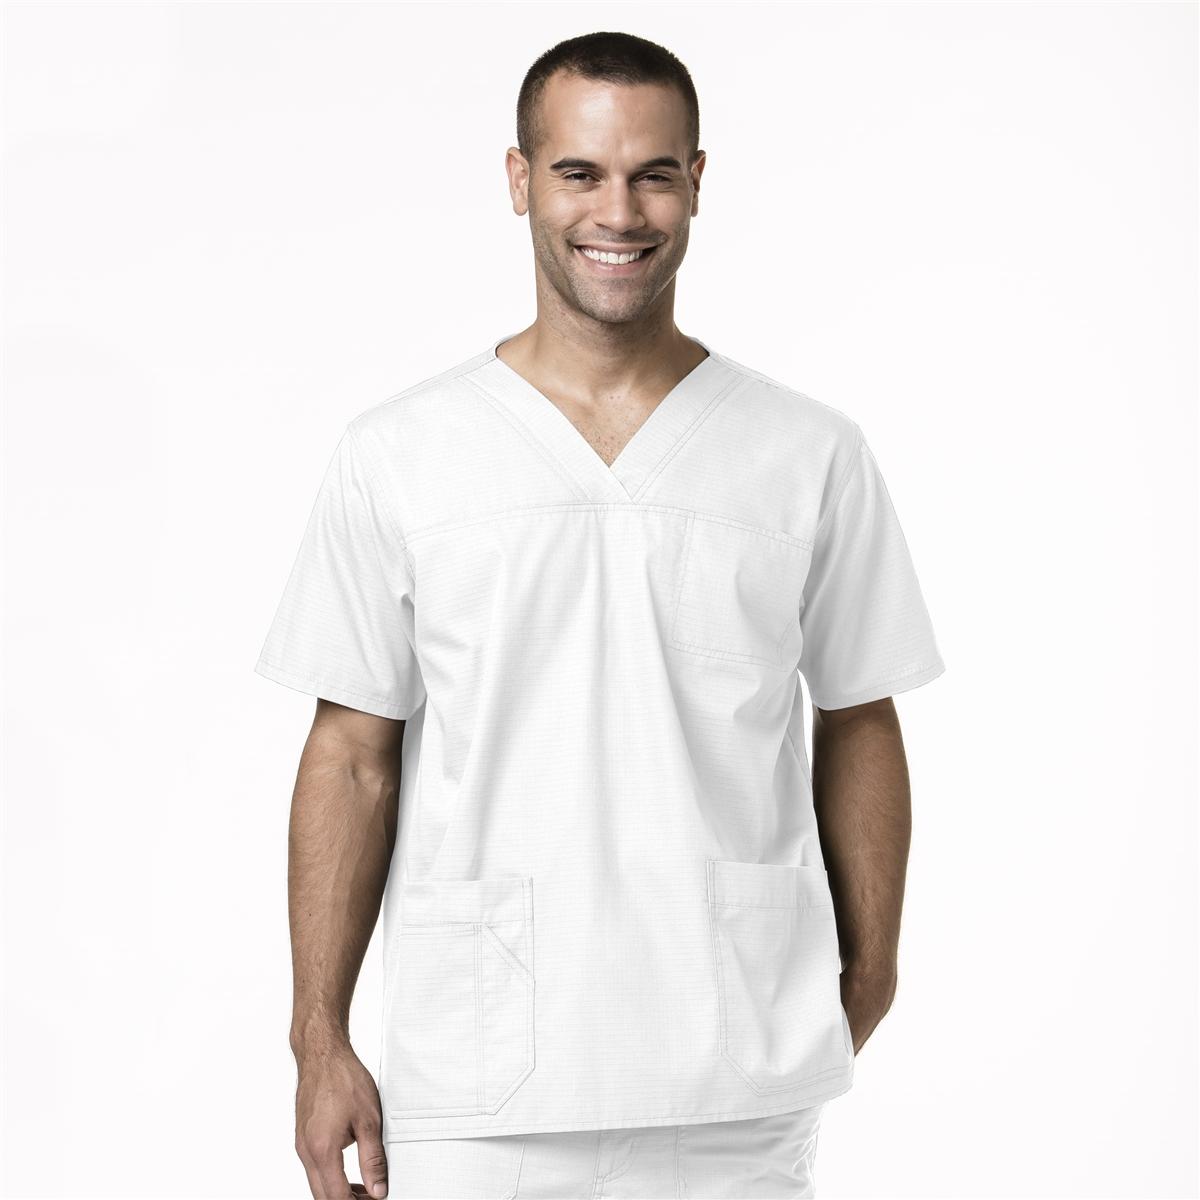 a11ea347928 Men's Multi-Pocket Ripstop Top in White - Carhartt Scrubs